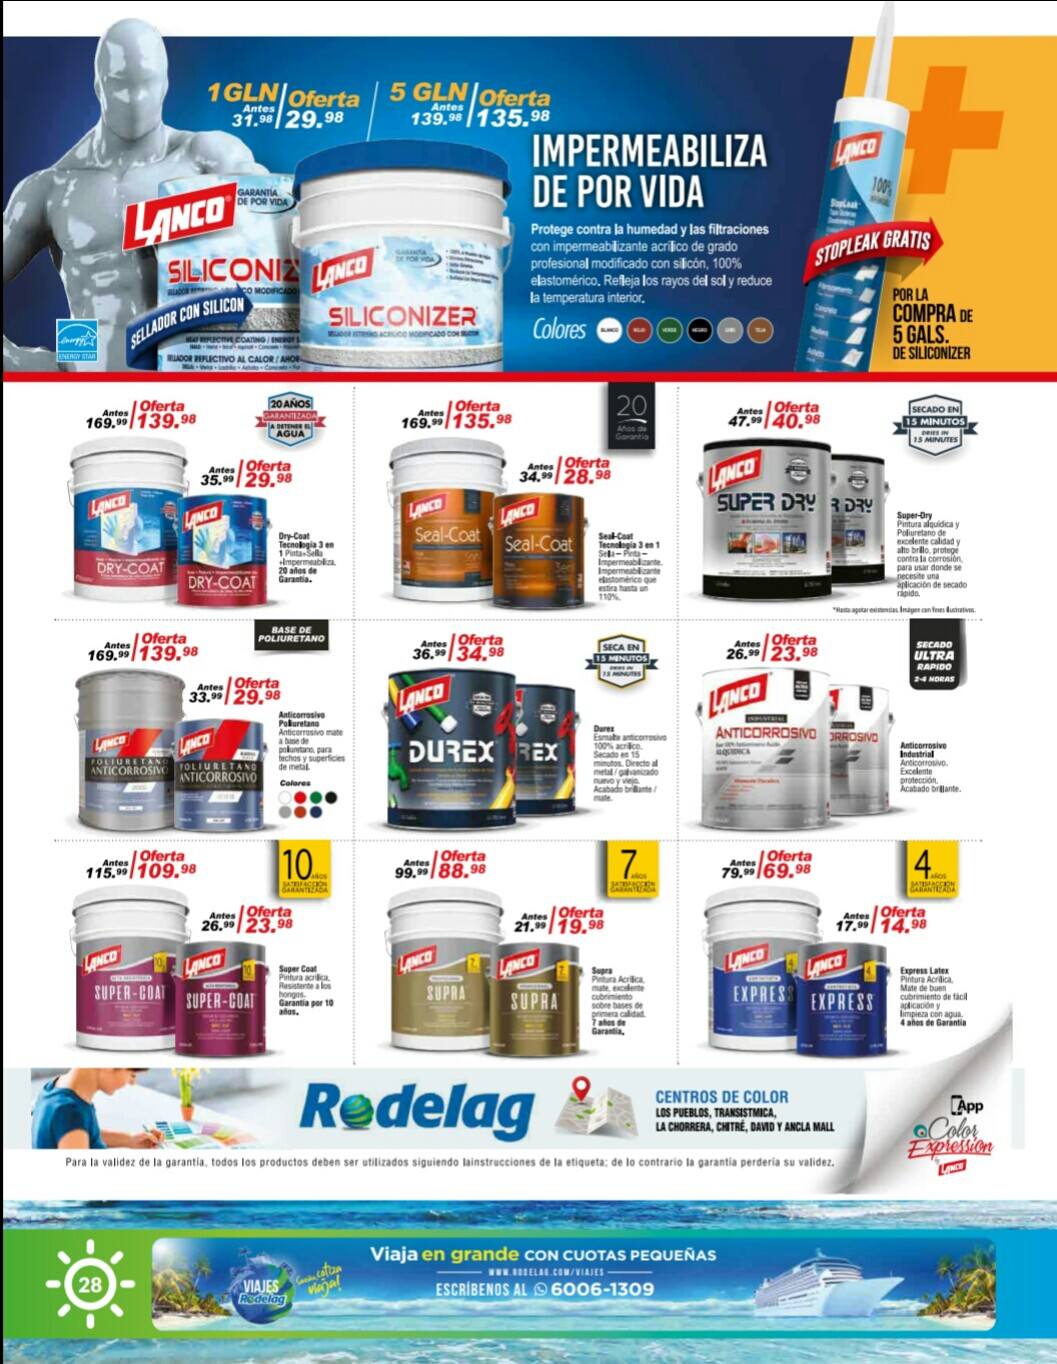 Catalogo Rodelag Verano 2020 p28